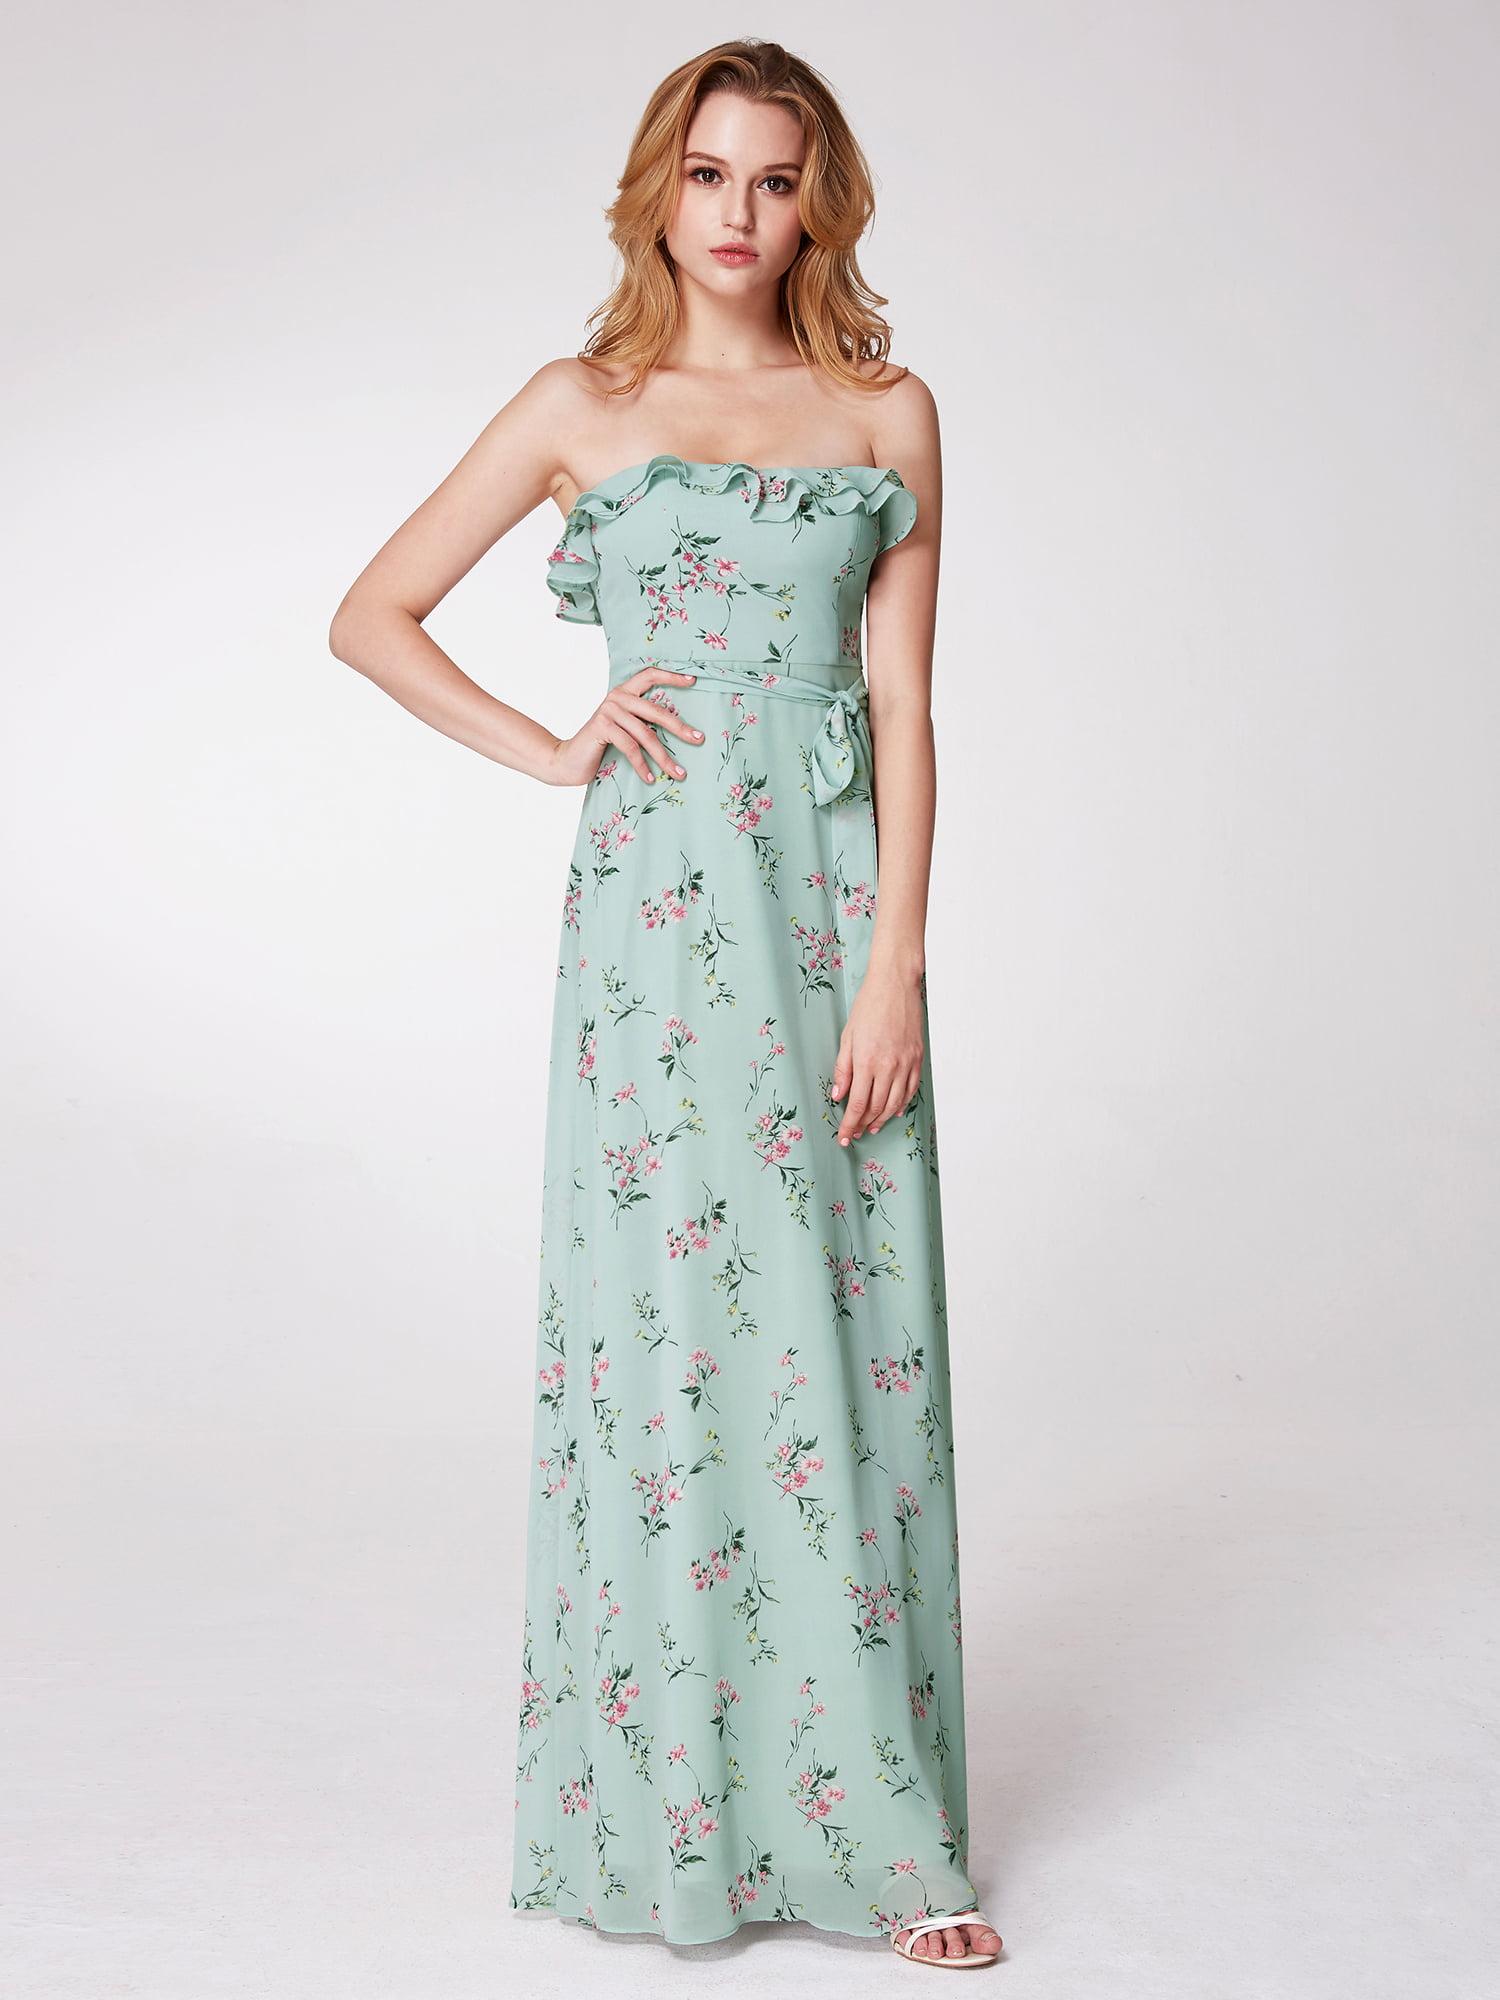 0047679efa0 Pretty Elegant Prom Dresses - Gomes Weine AG